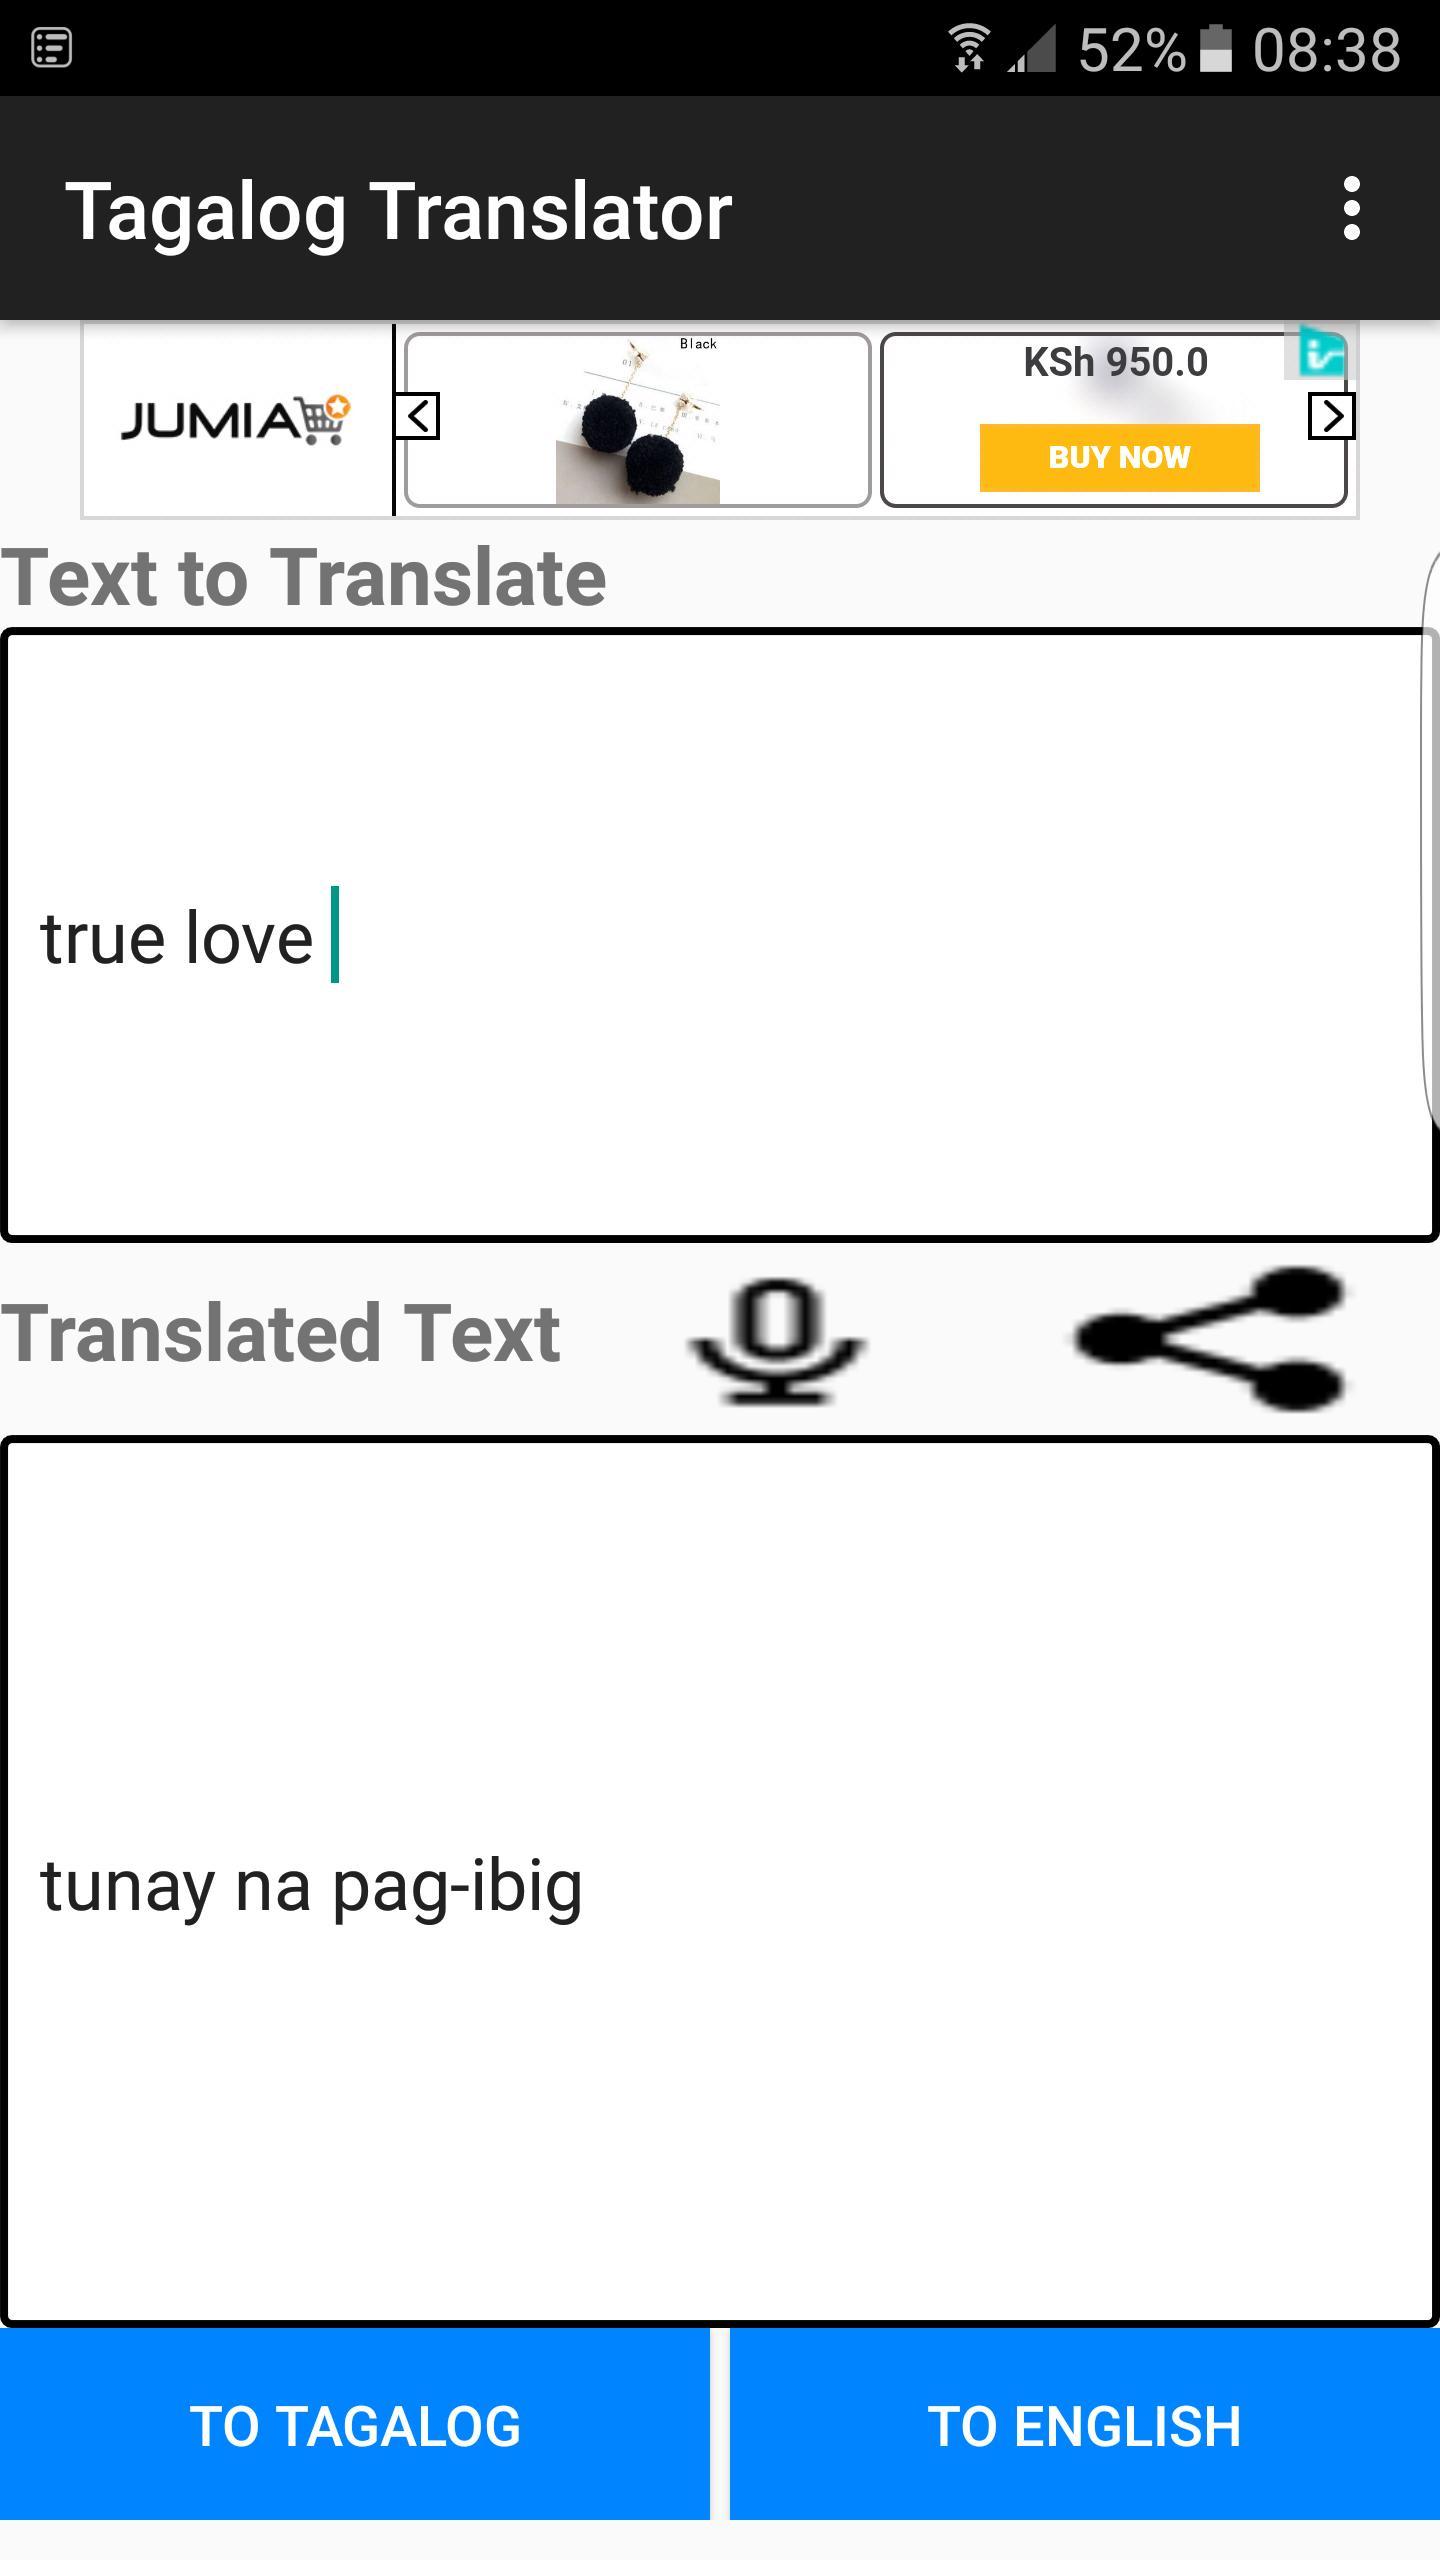 English tagalog to FREE Tagalog